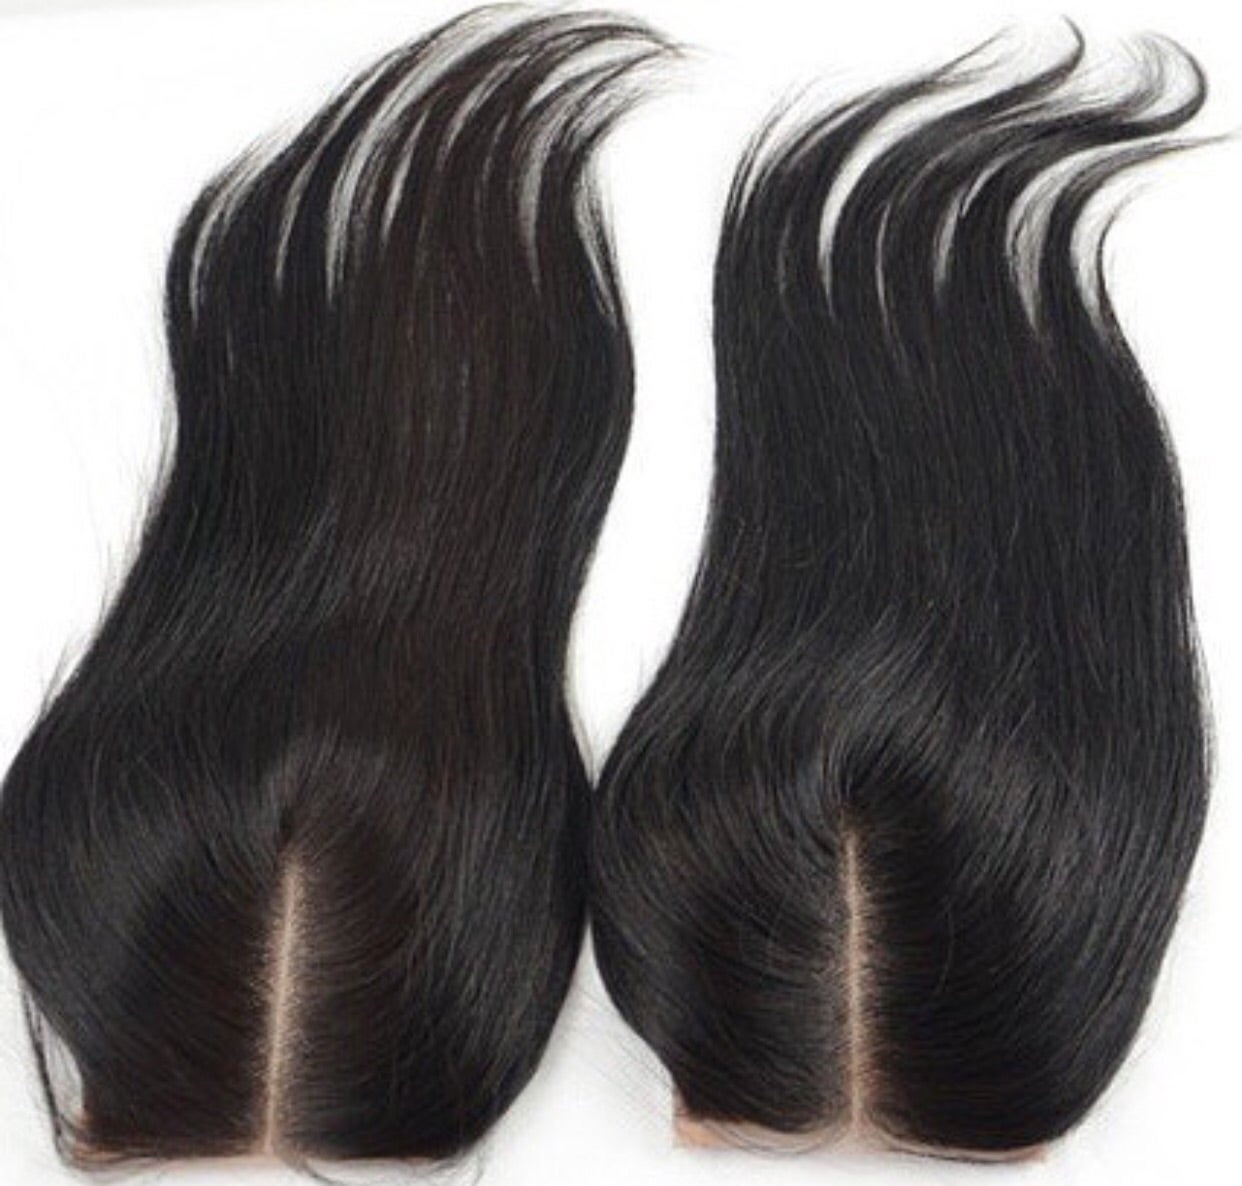 Eccentric Hair Extensions Home